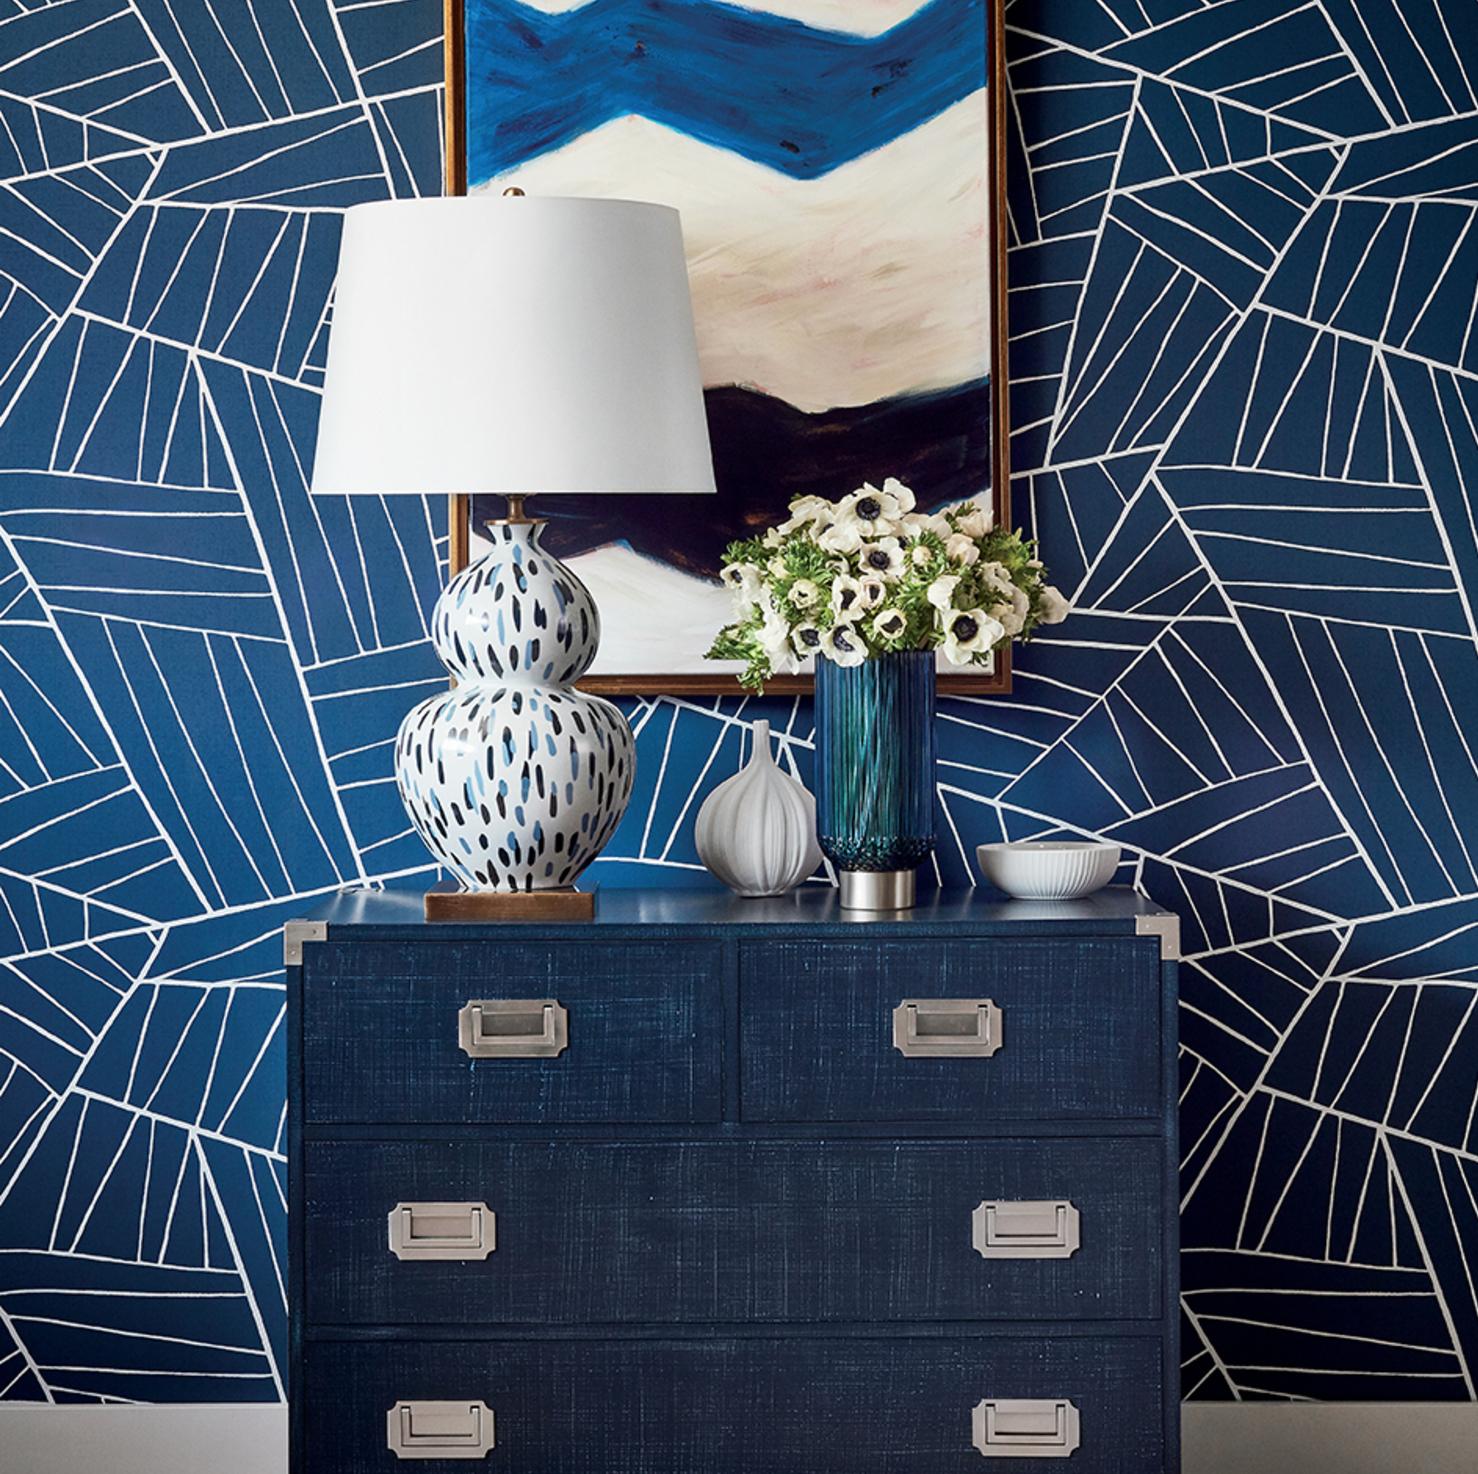 Thibaut Wallpapers Wallpaper online, Fabric wallpaper